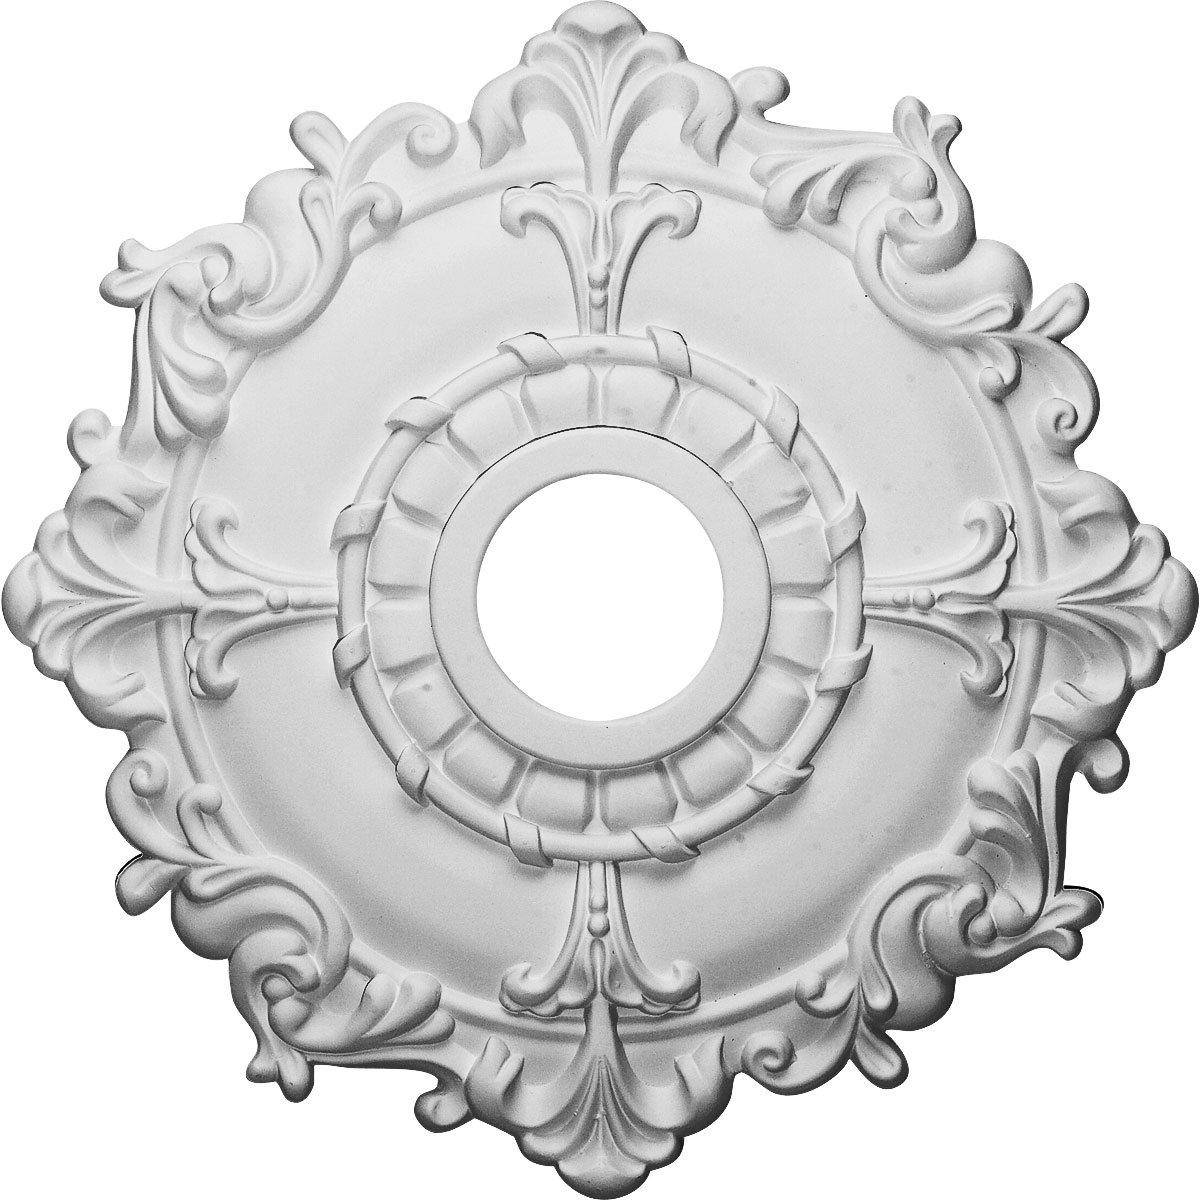 Best sellers - Home Lighting Ceiling Medallions Amazon.com Lighting & Ceiling